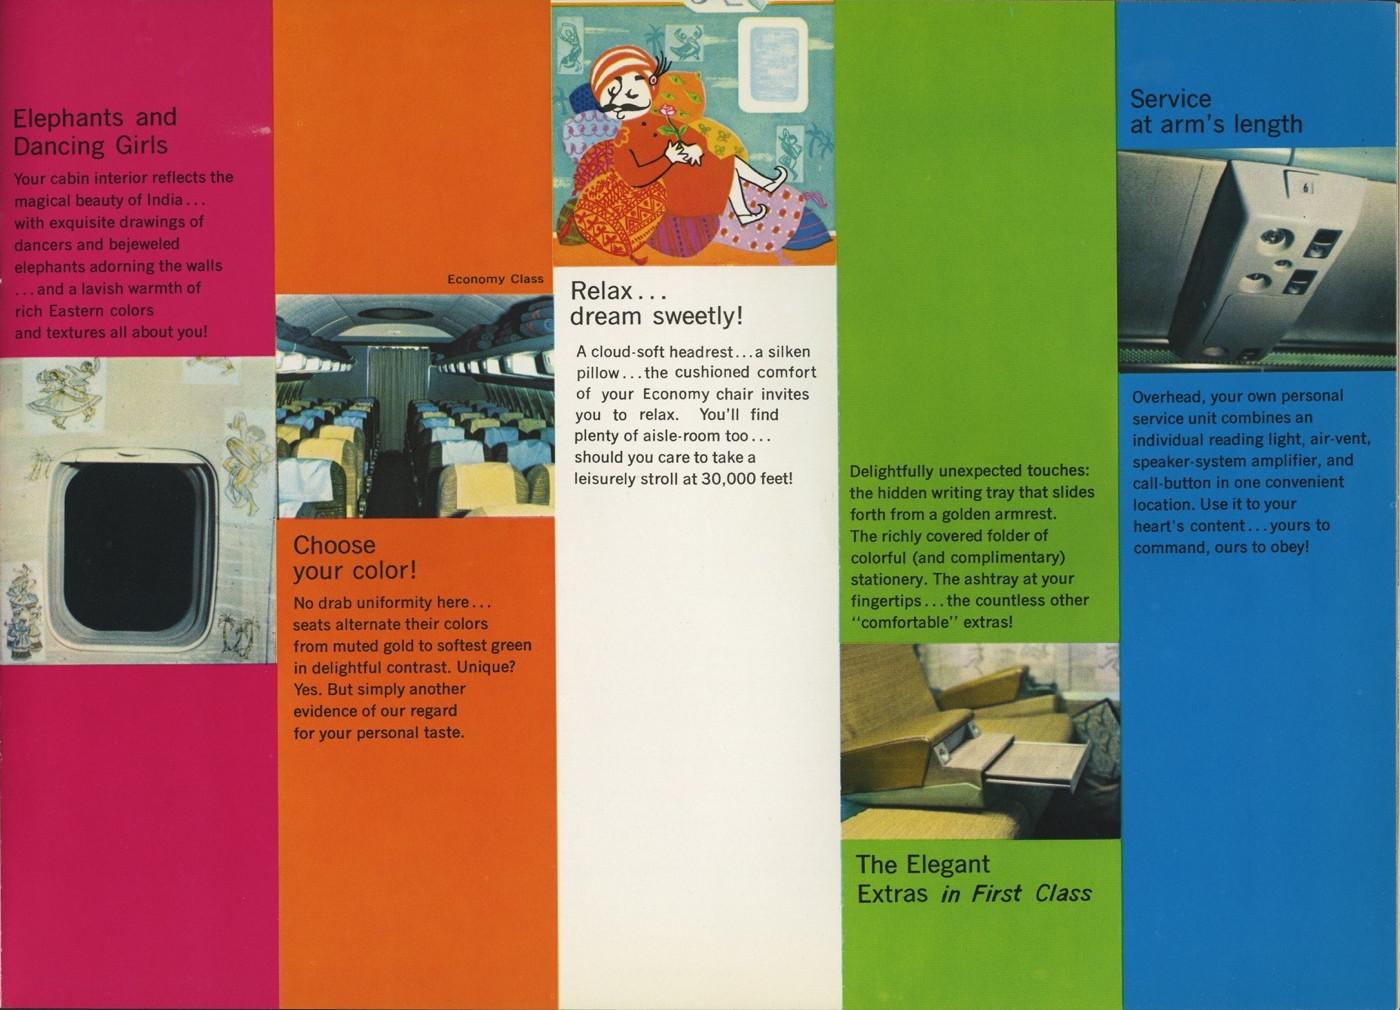 Air India Advertisement Brochure   South Asian American Digital ...